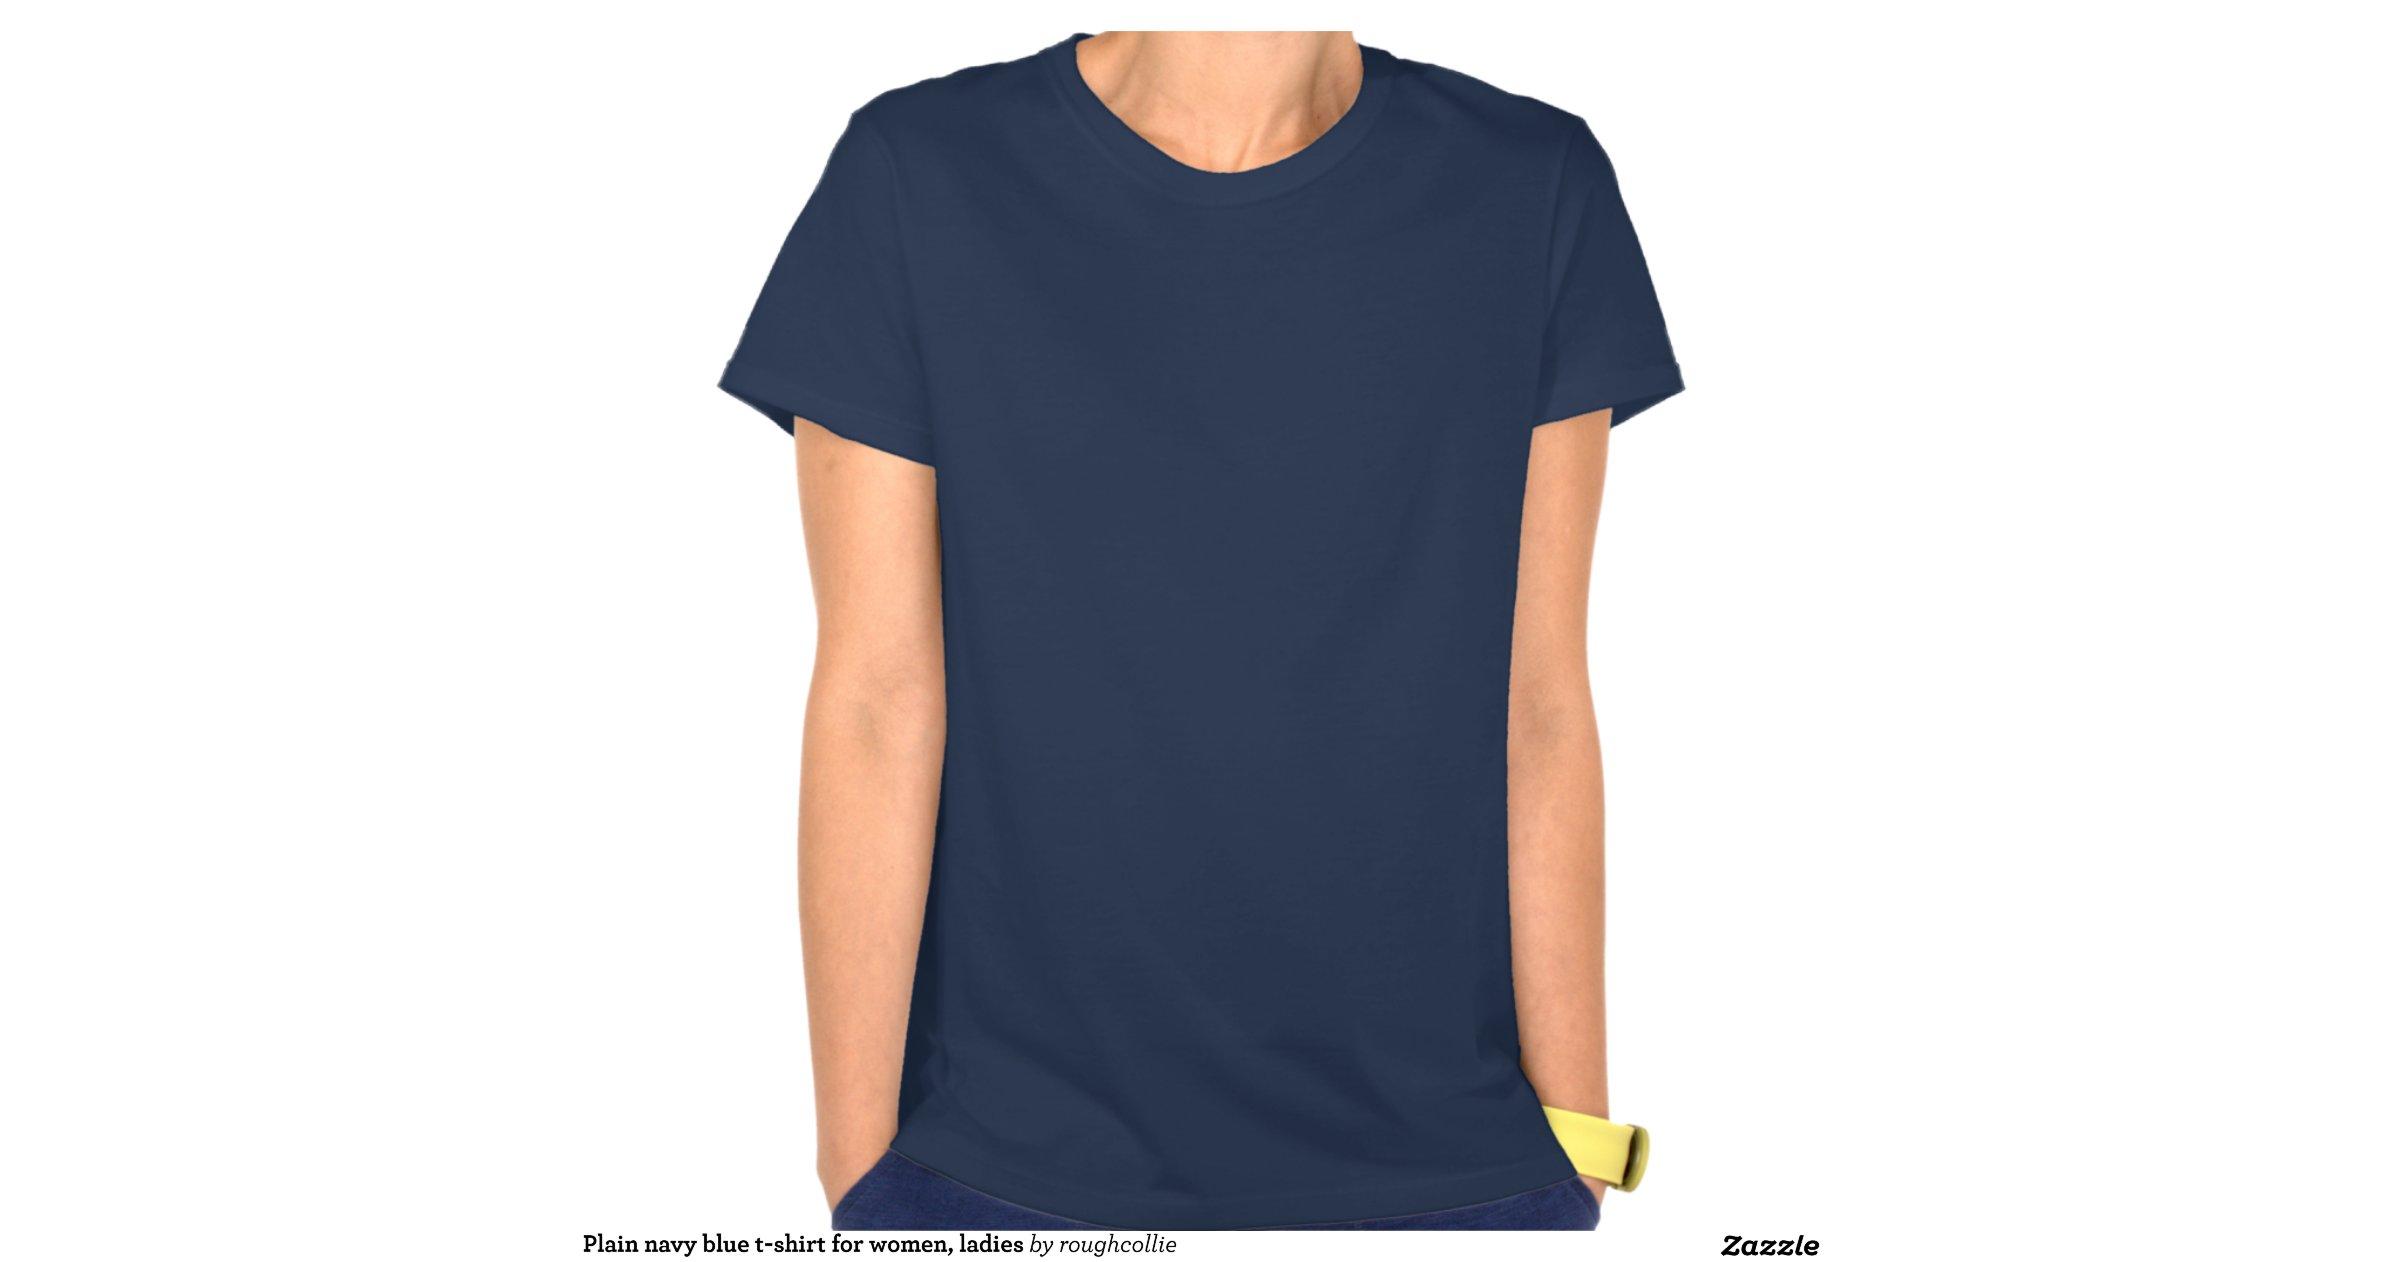 plain_navy_blue_t_shirt_for_women_ladies ...